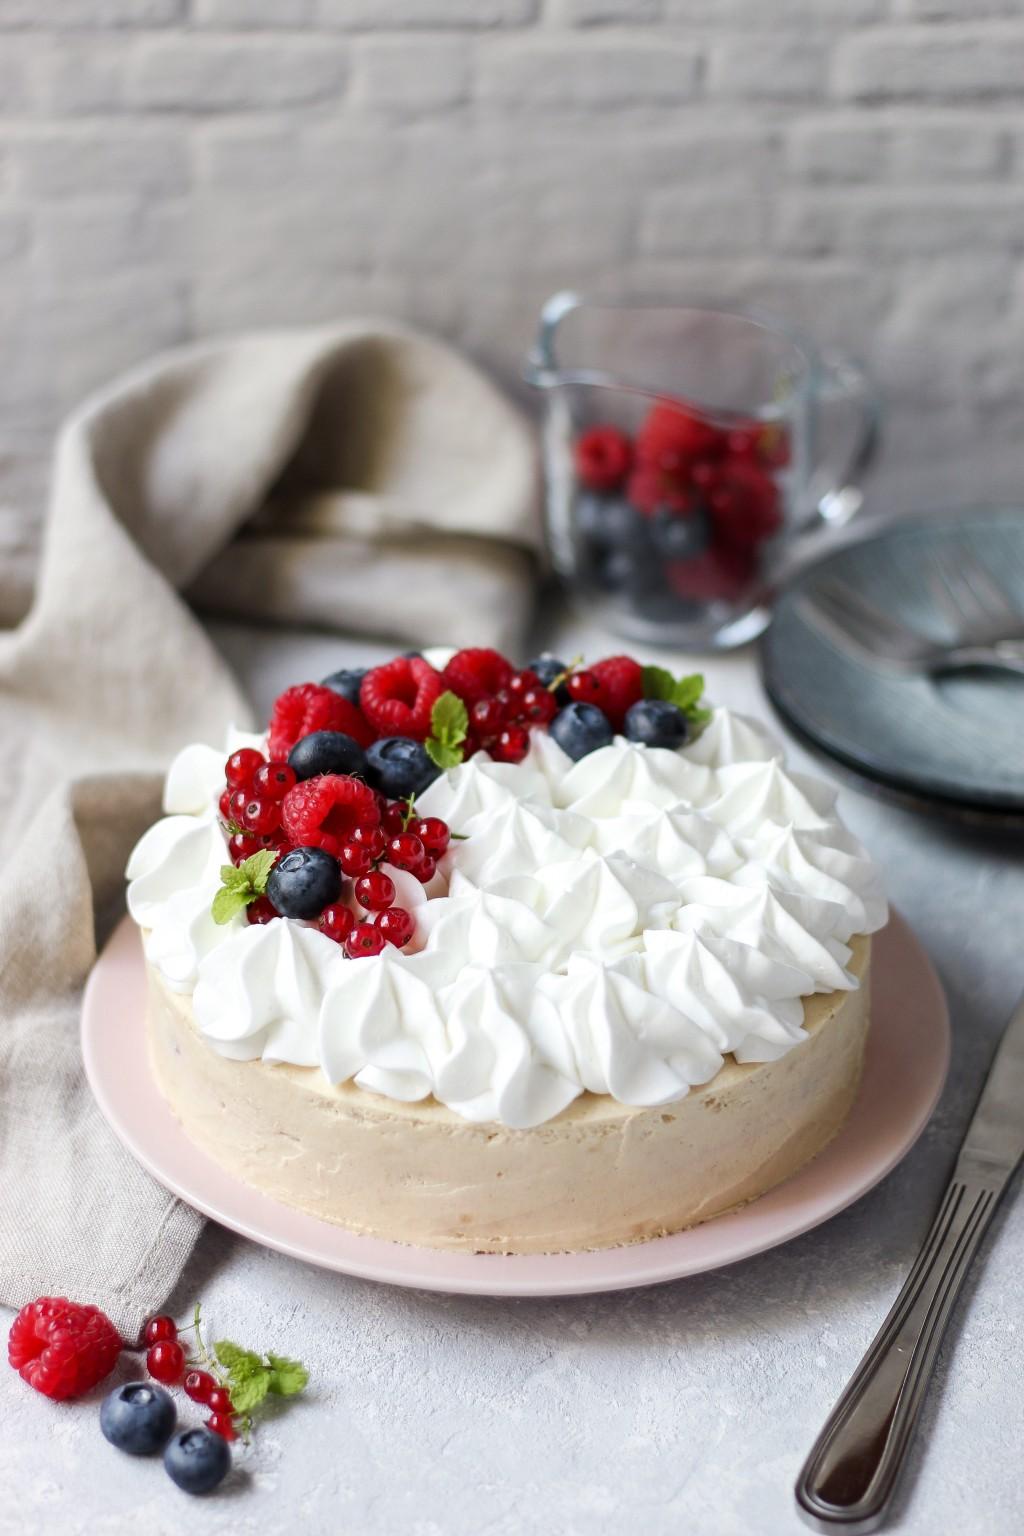 Brza torta sa malinama bez pečenja 1